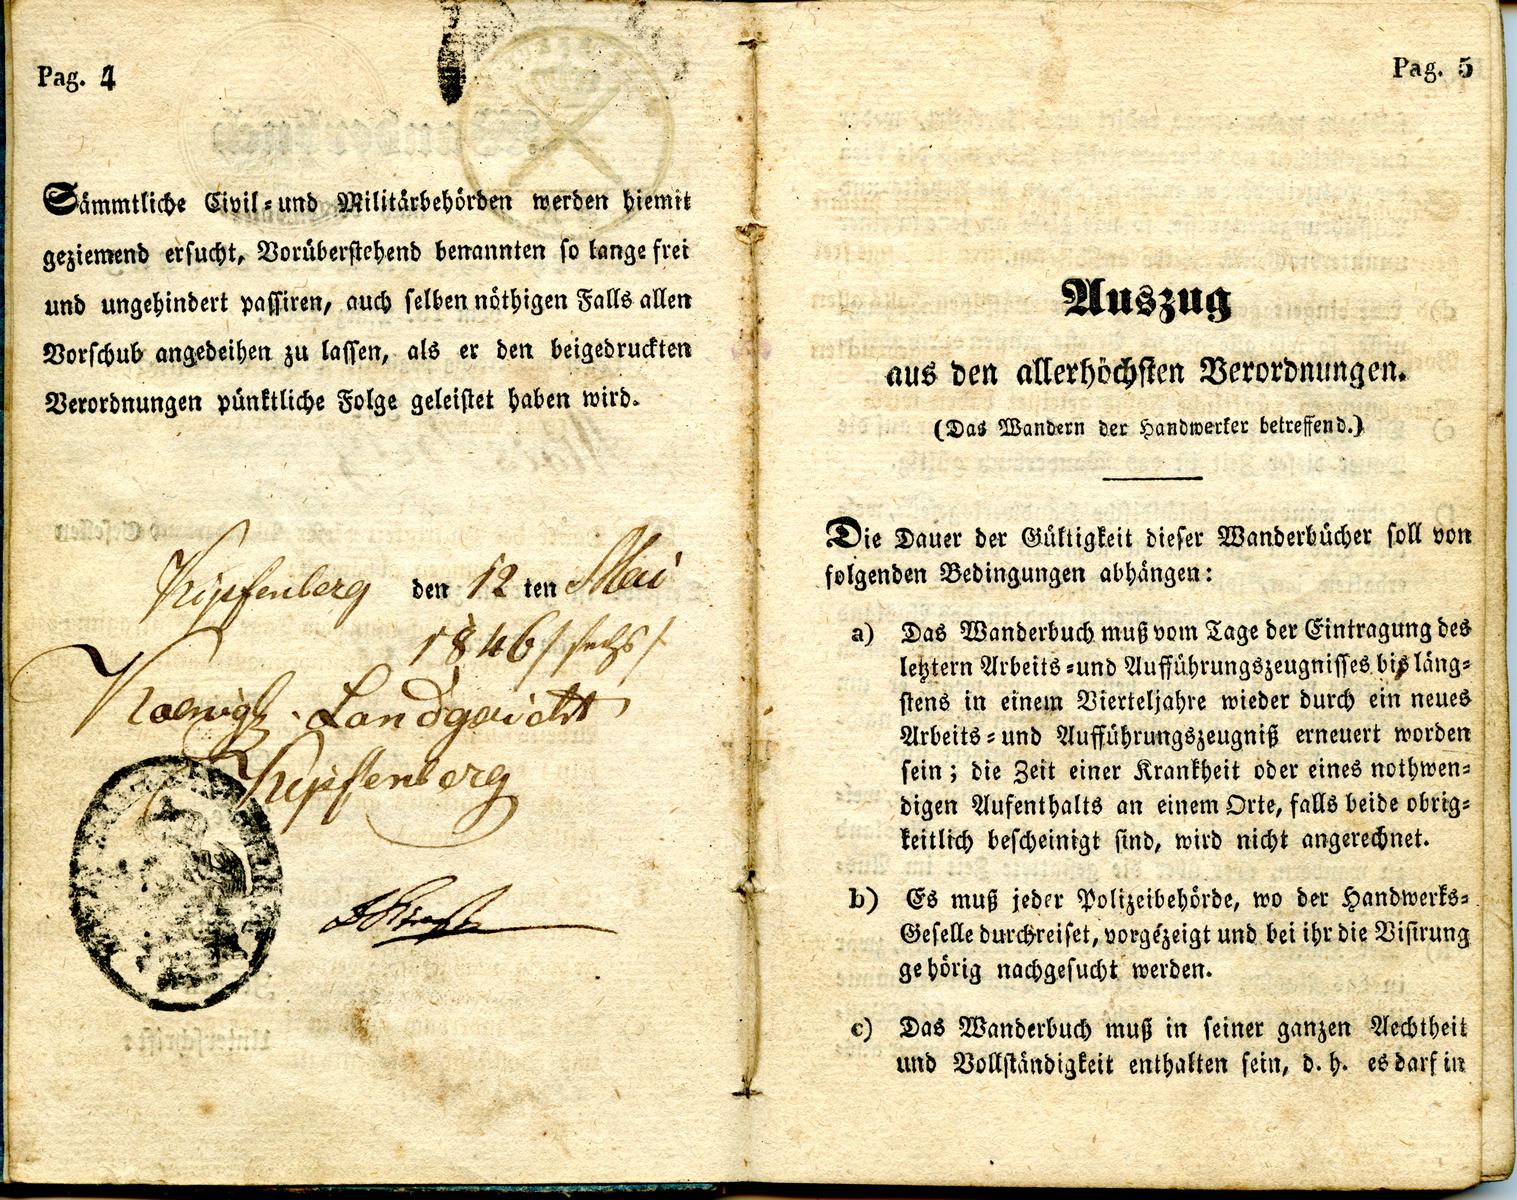 abetz_wanderbuch_4-5_large